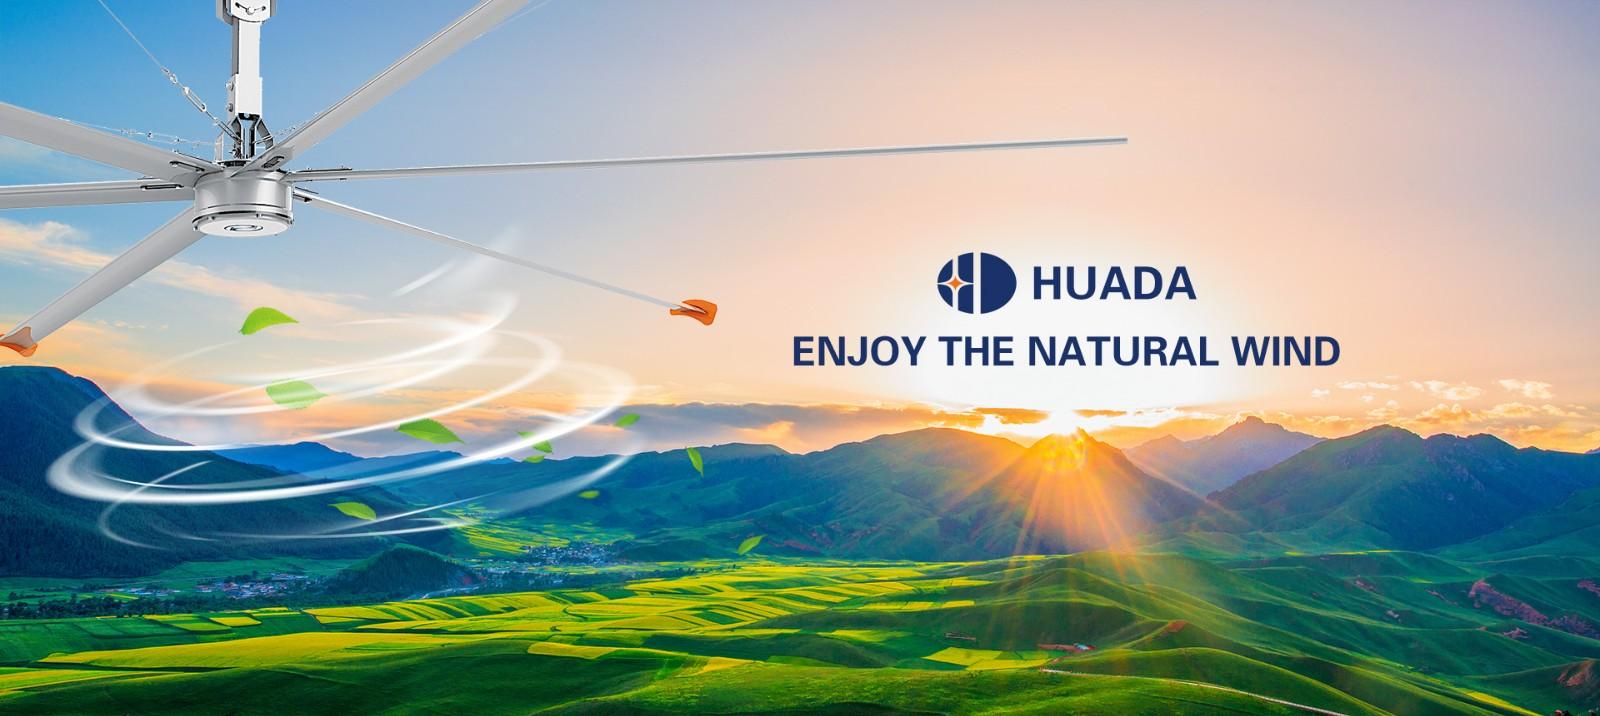 FUJIAN HUADA ELECTRIC CO.,LTD